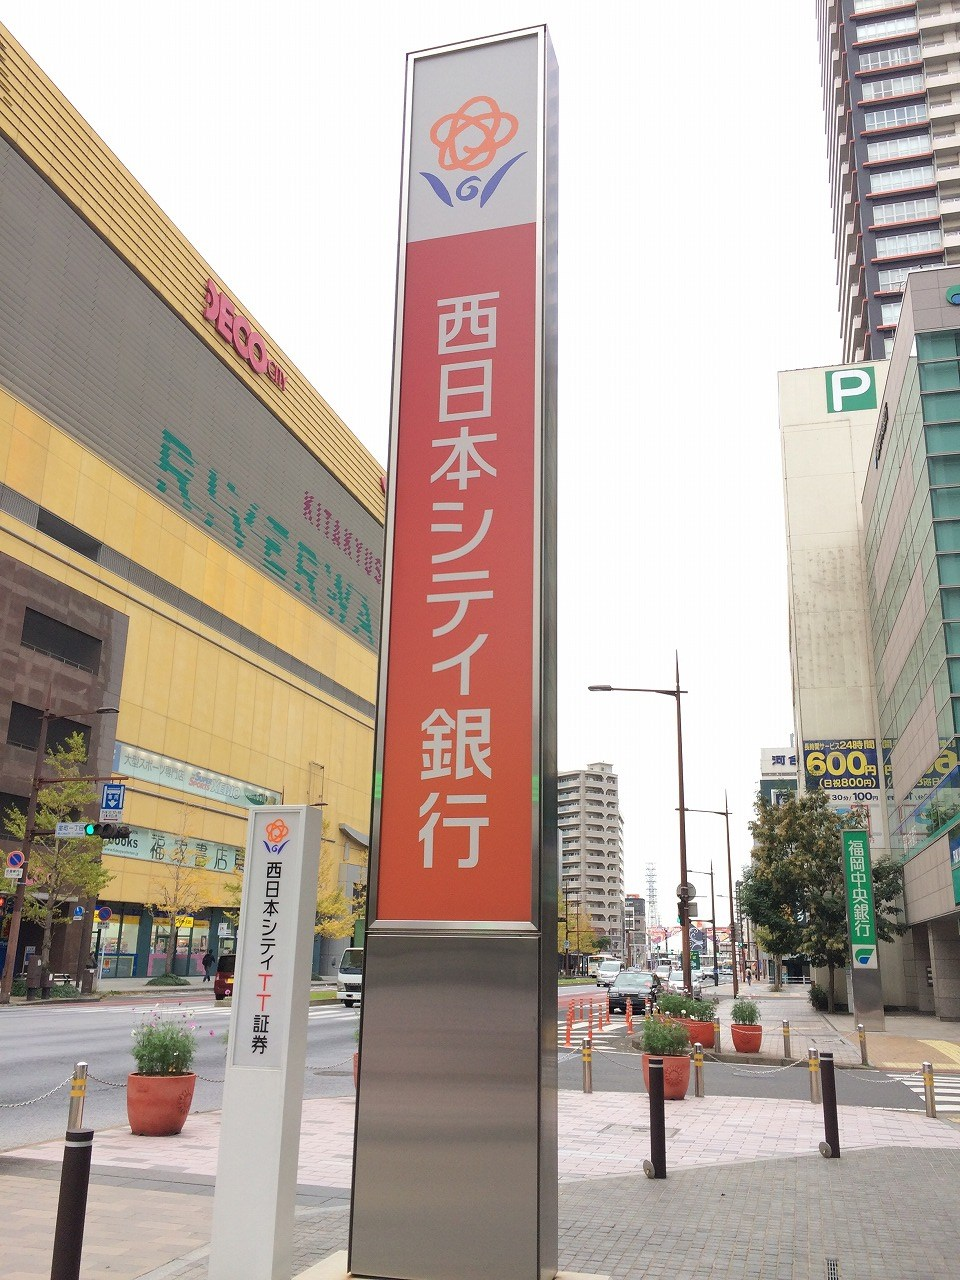 銀行:西日本シティ銀行戸畑支店 334m